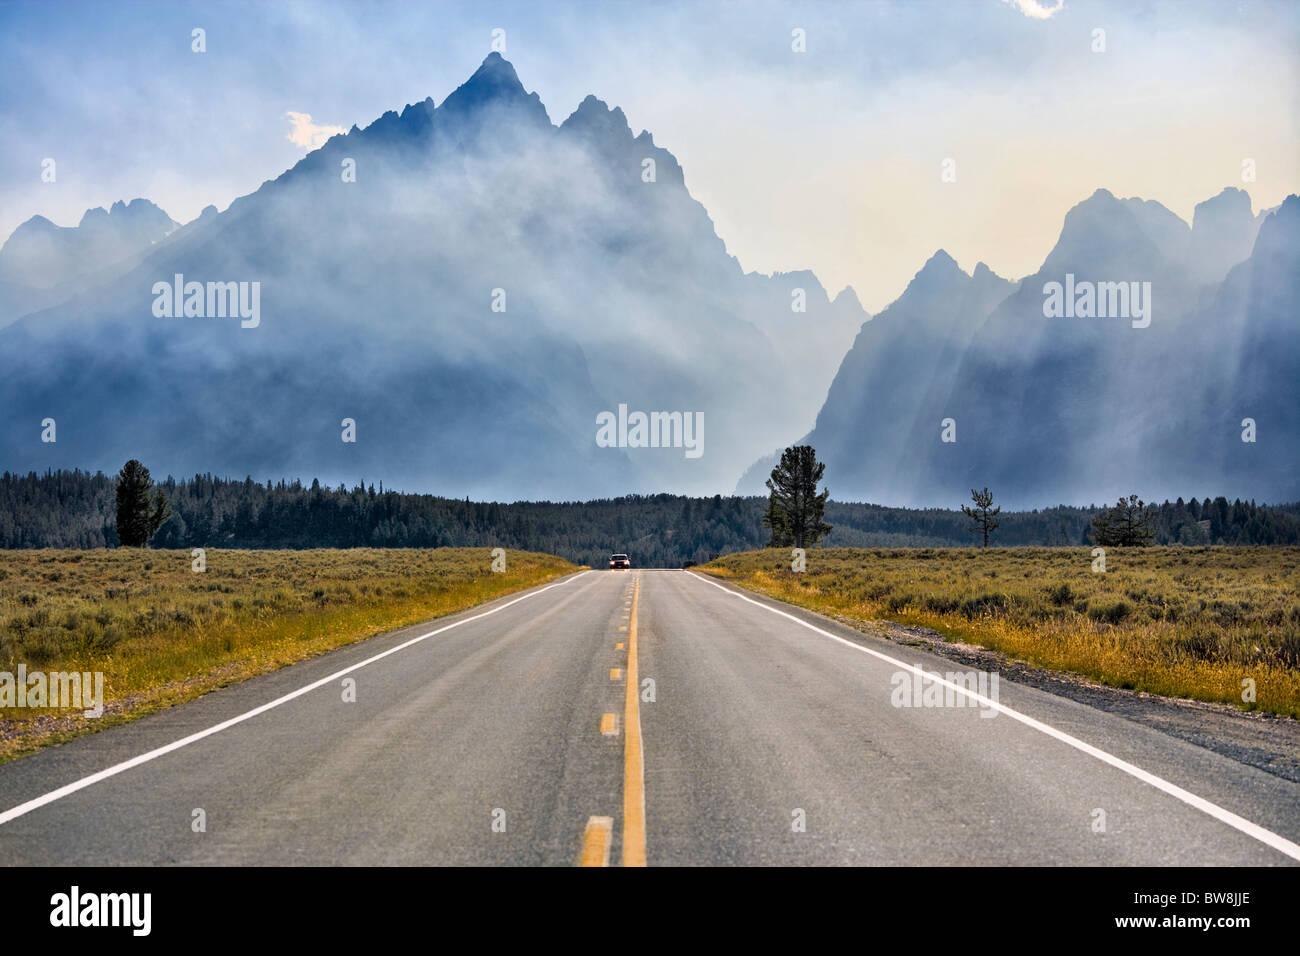 Mount Teton in Grand Teton Nationalpark Wyoming. Jenny Lake Loop Road Scenic Byway. Rauch aus kontrollierte Brände. Stockbild